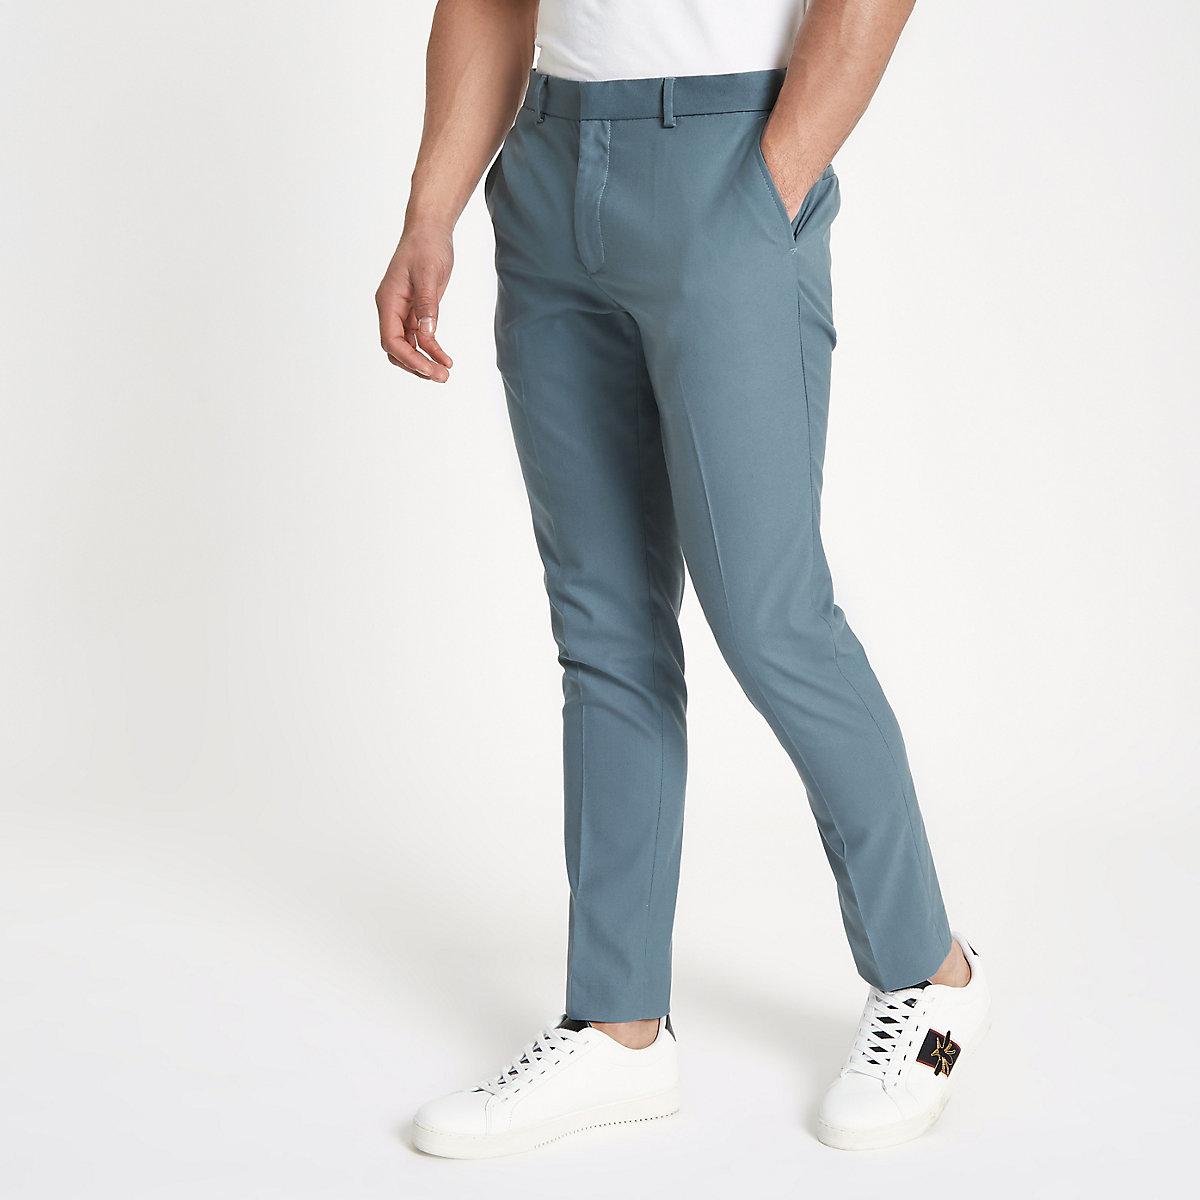 Pantalon habillé skinny bleu